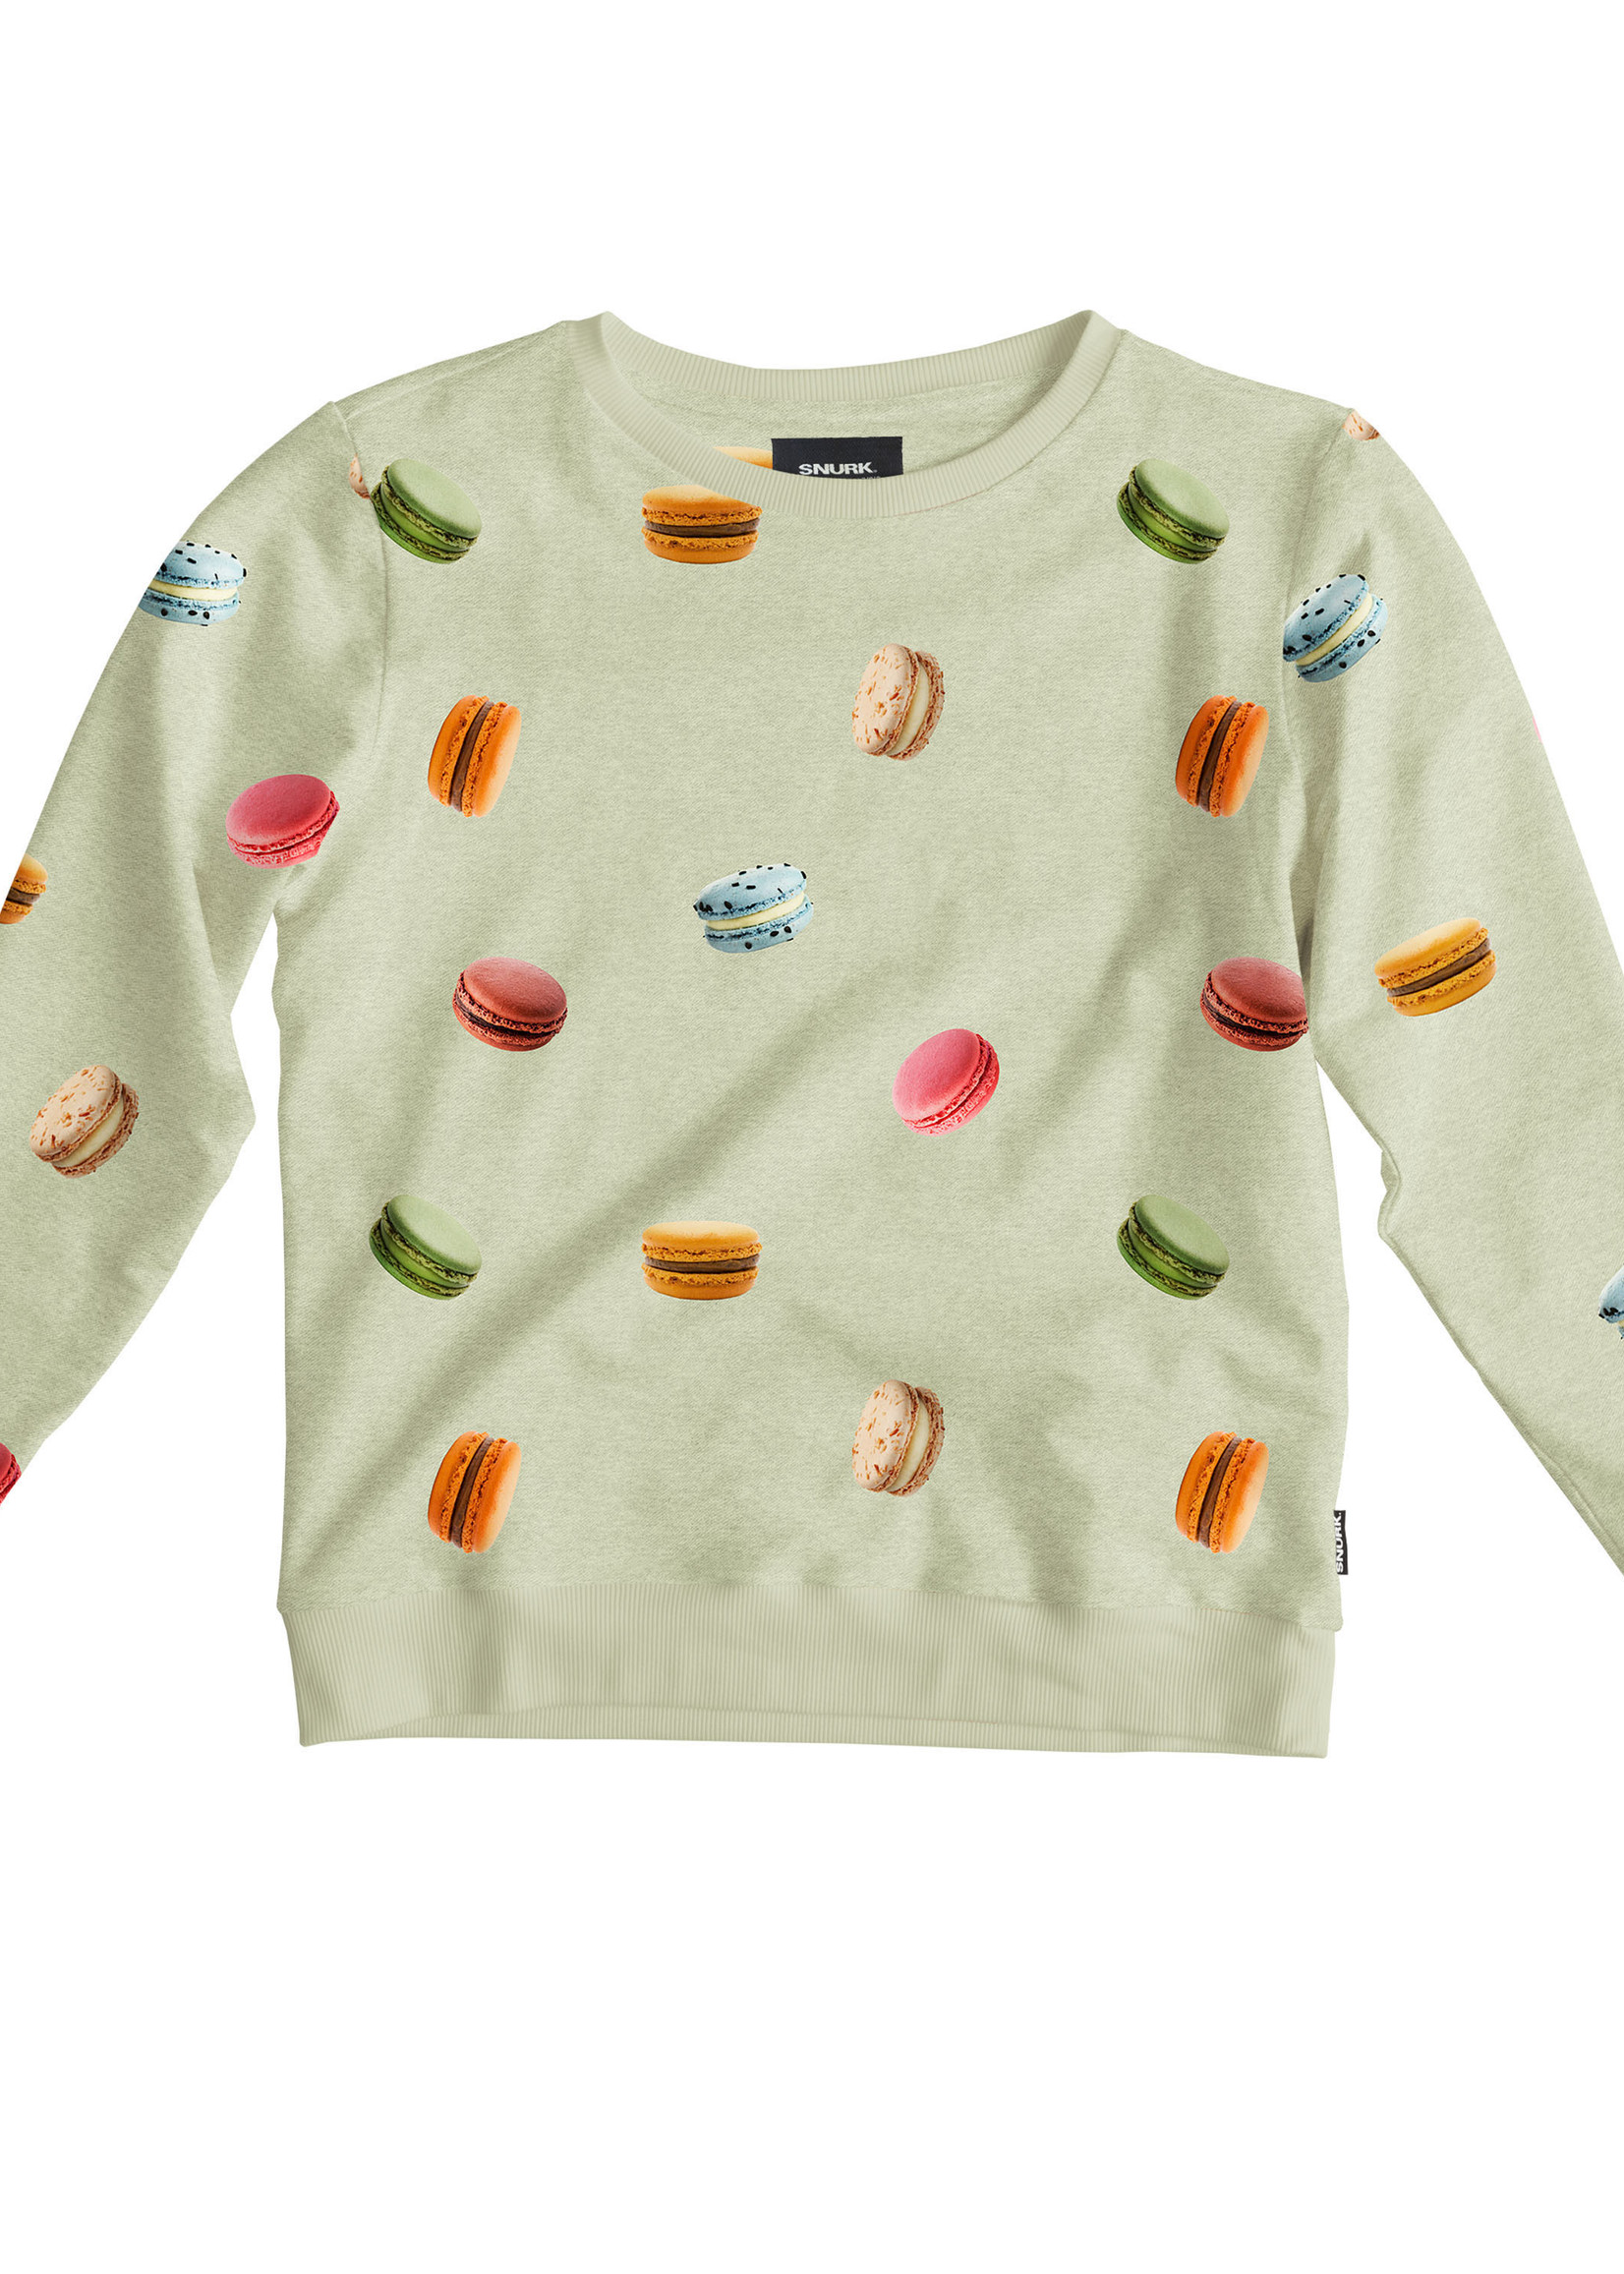 Snurk Macarons Green Sweater